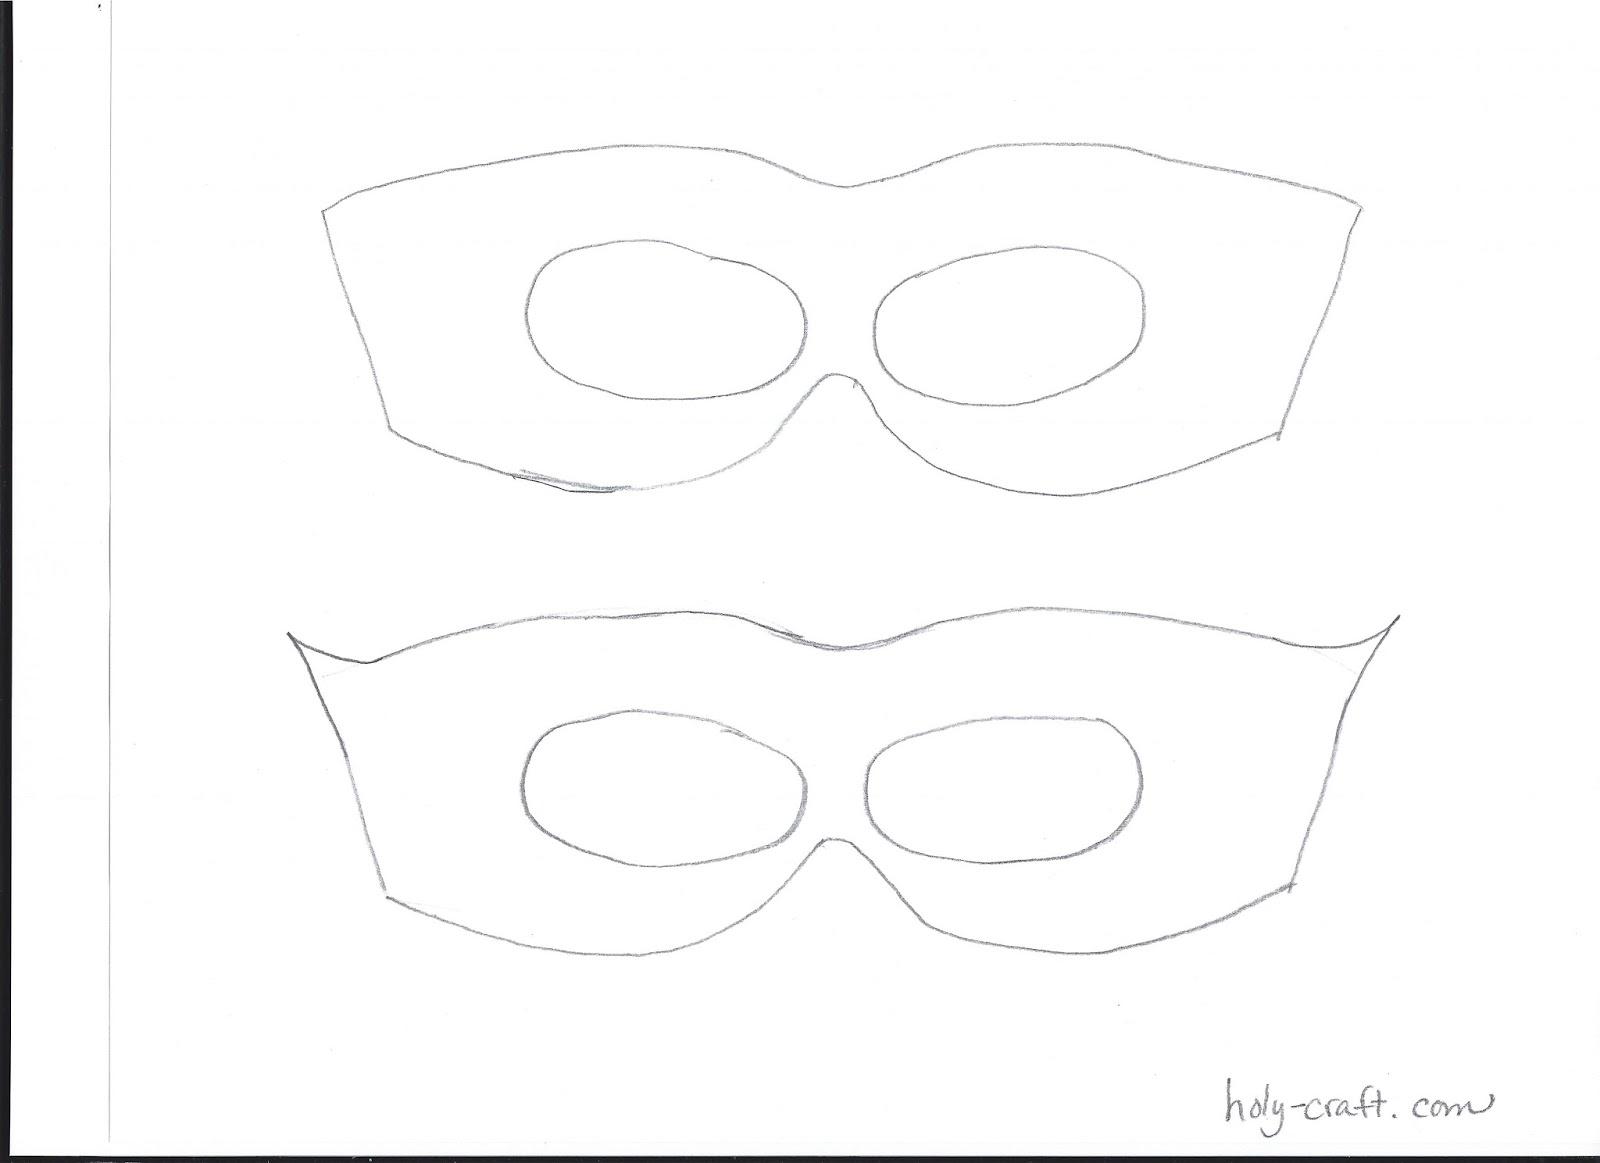 Super hero mask and crown tutorial with free template rachel teodoro maxwellsz